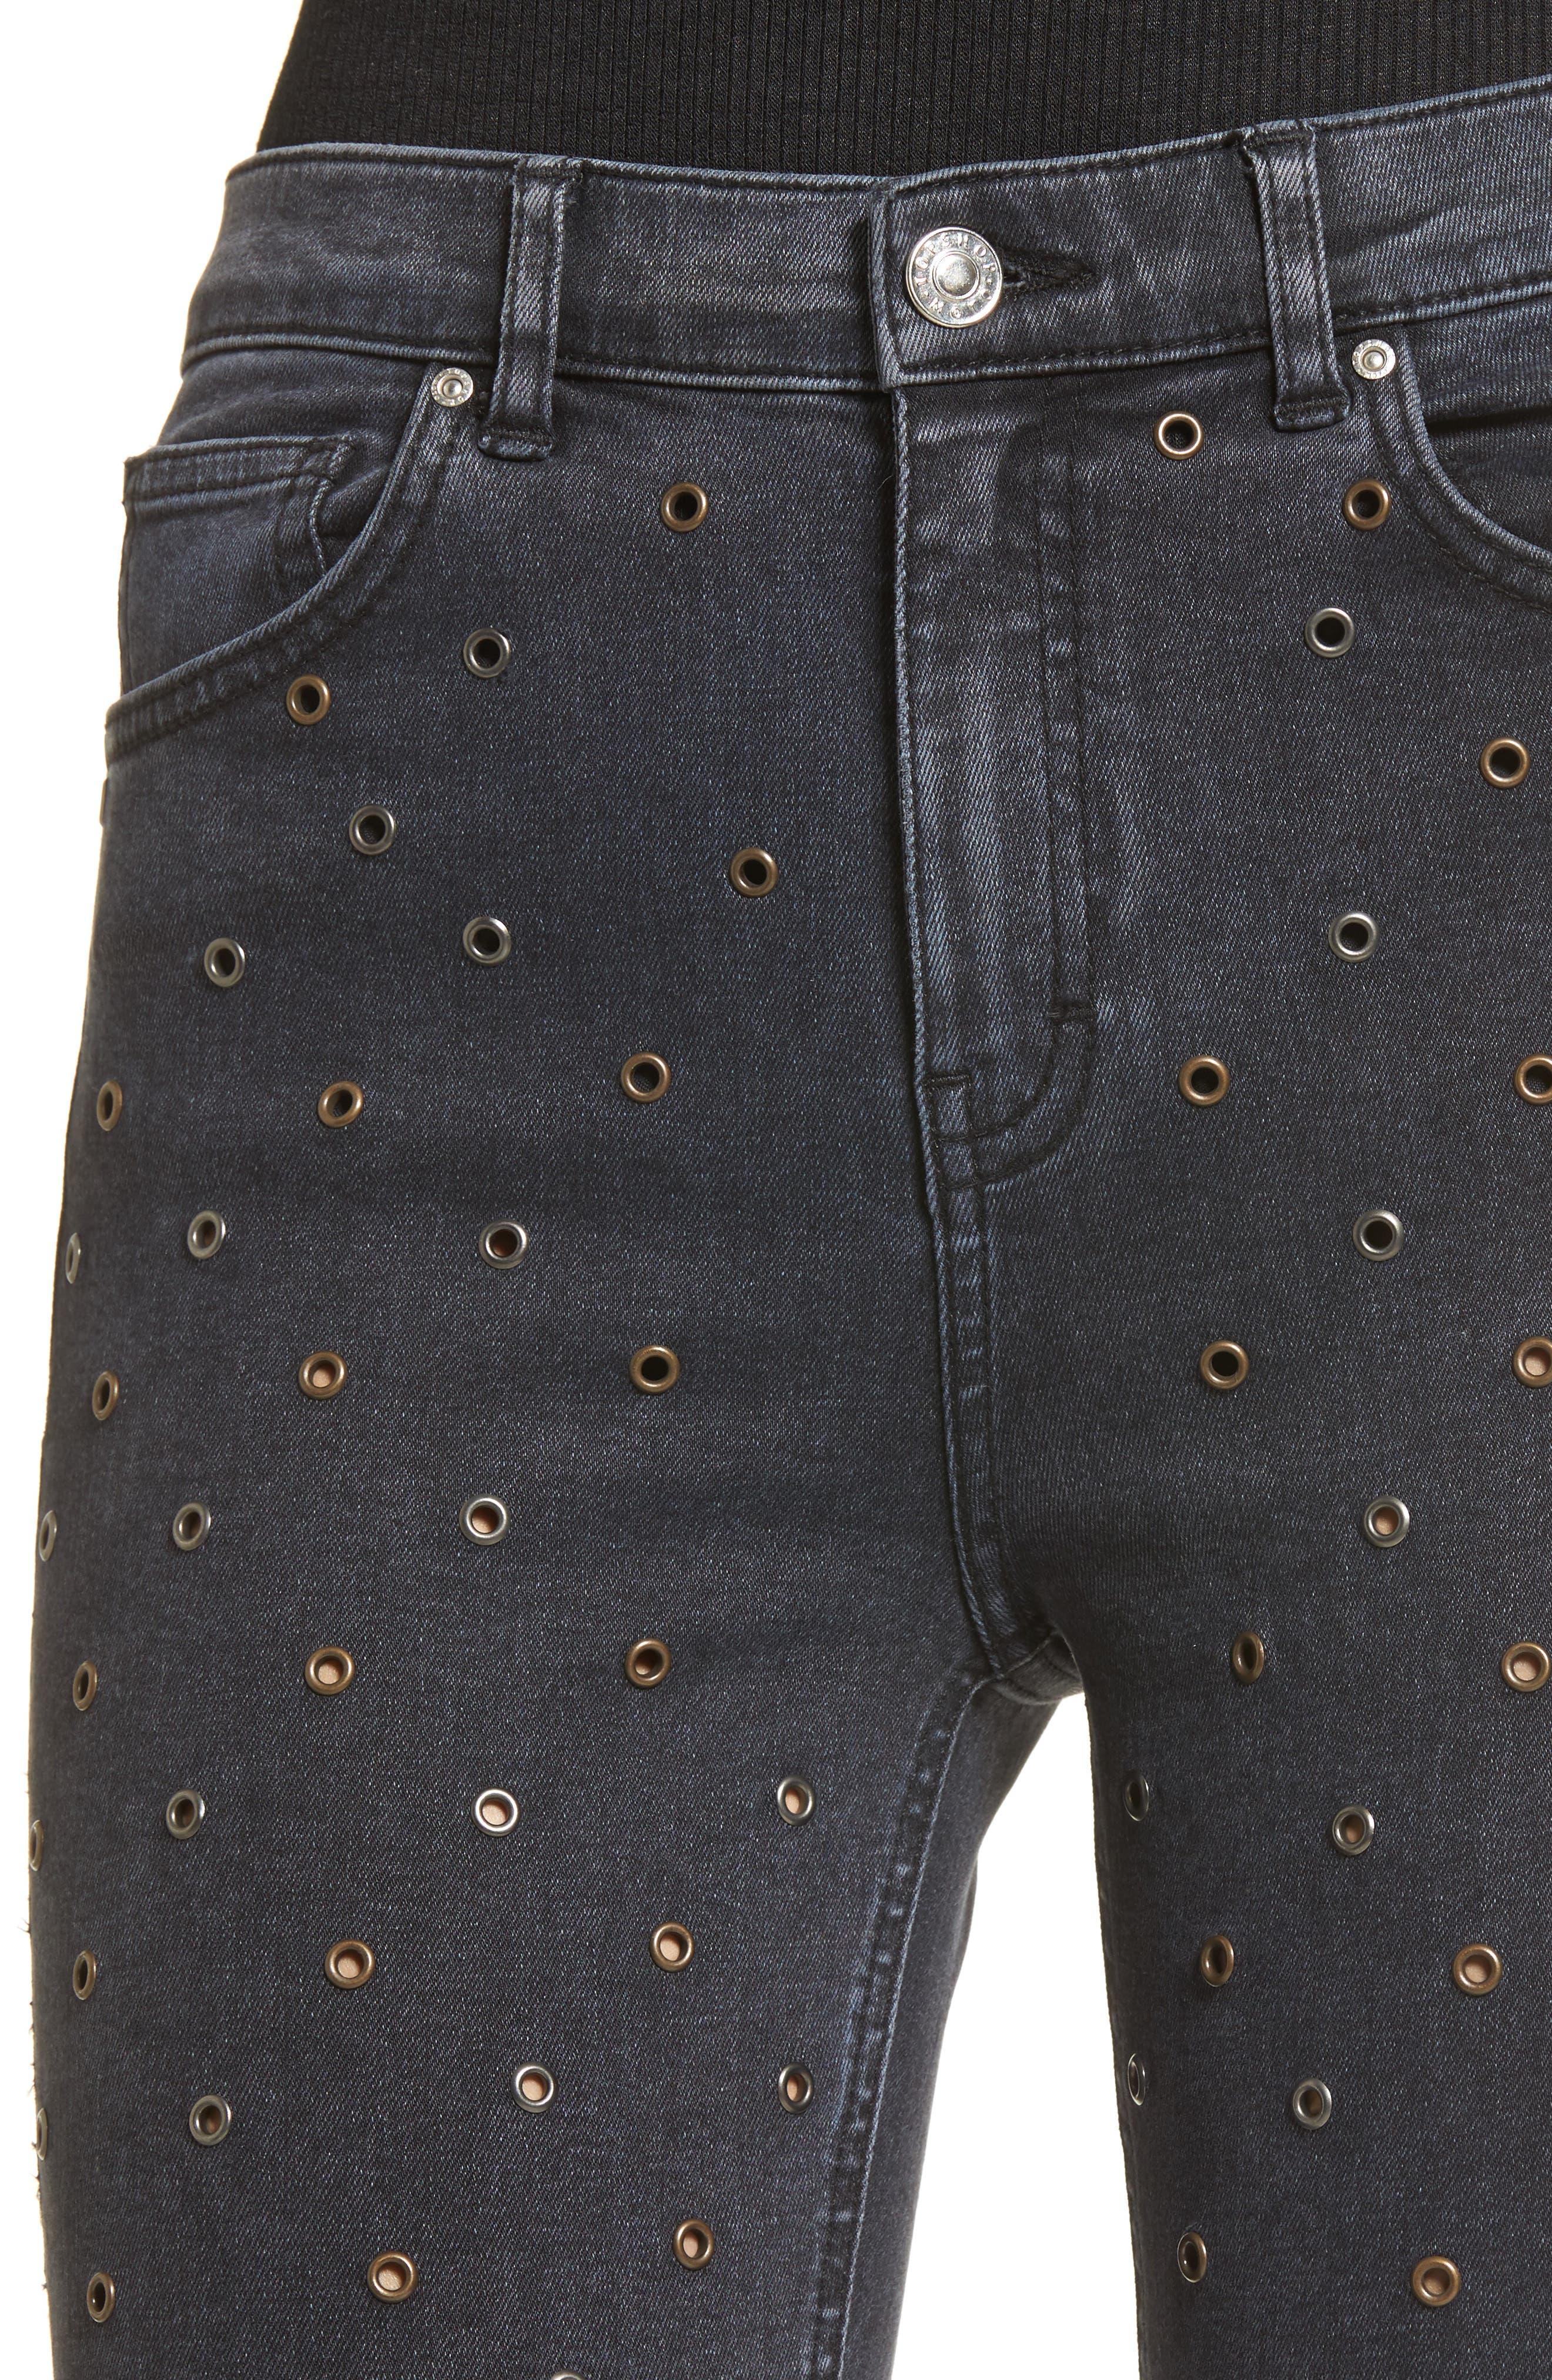 Jamie Grommet Ankle Skinny Jeans,                             Alternate thumbnail 4, color,                             001